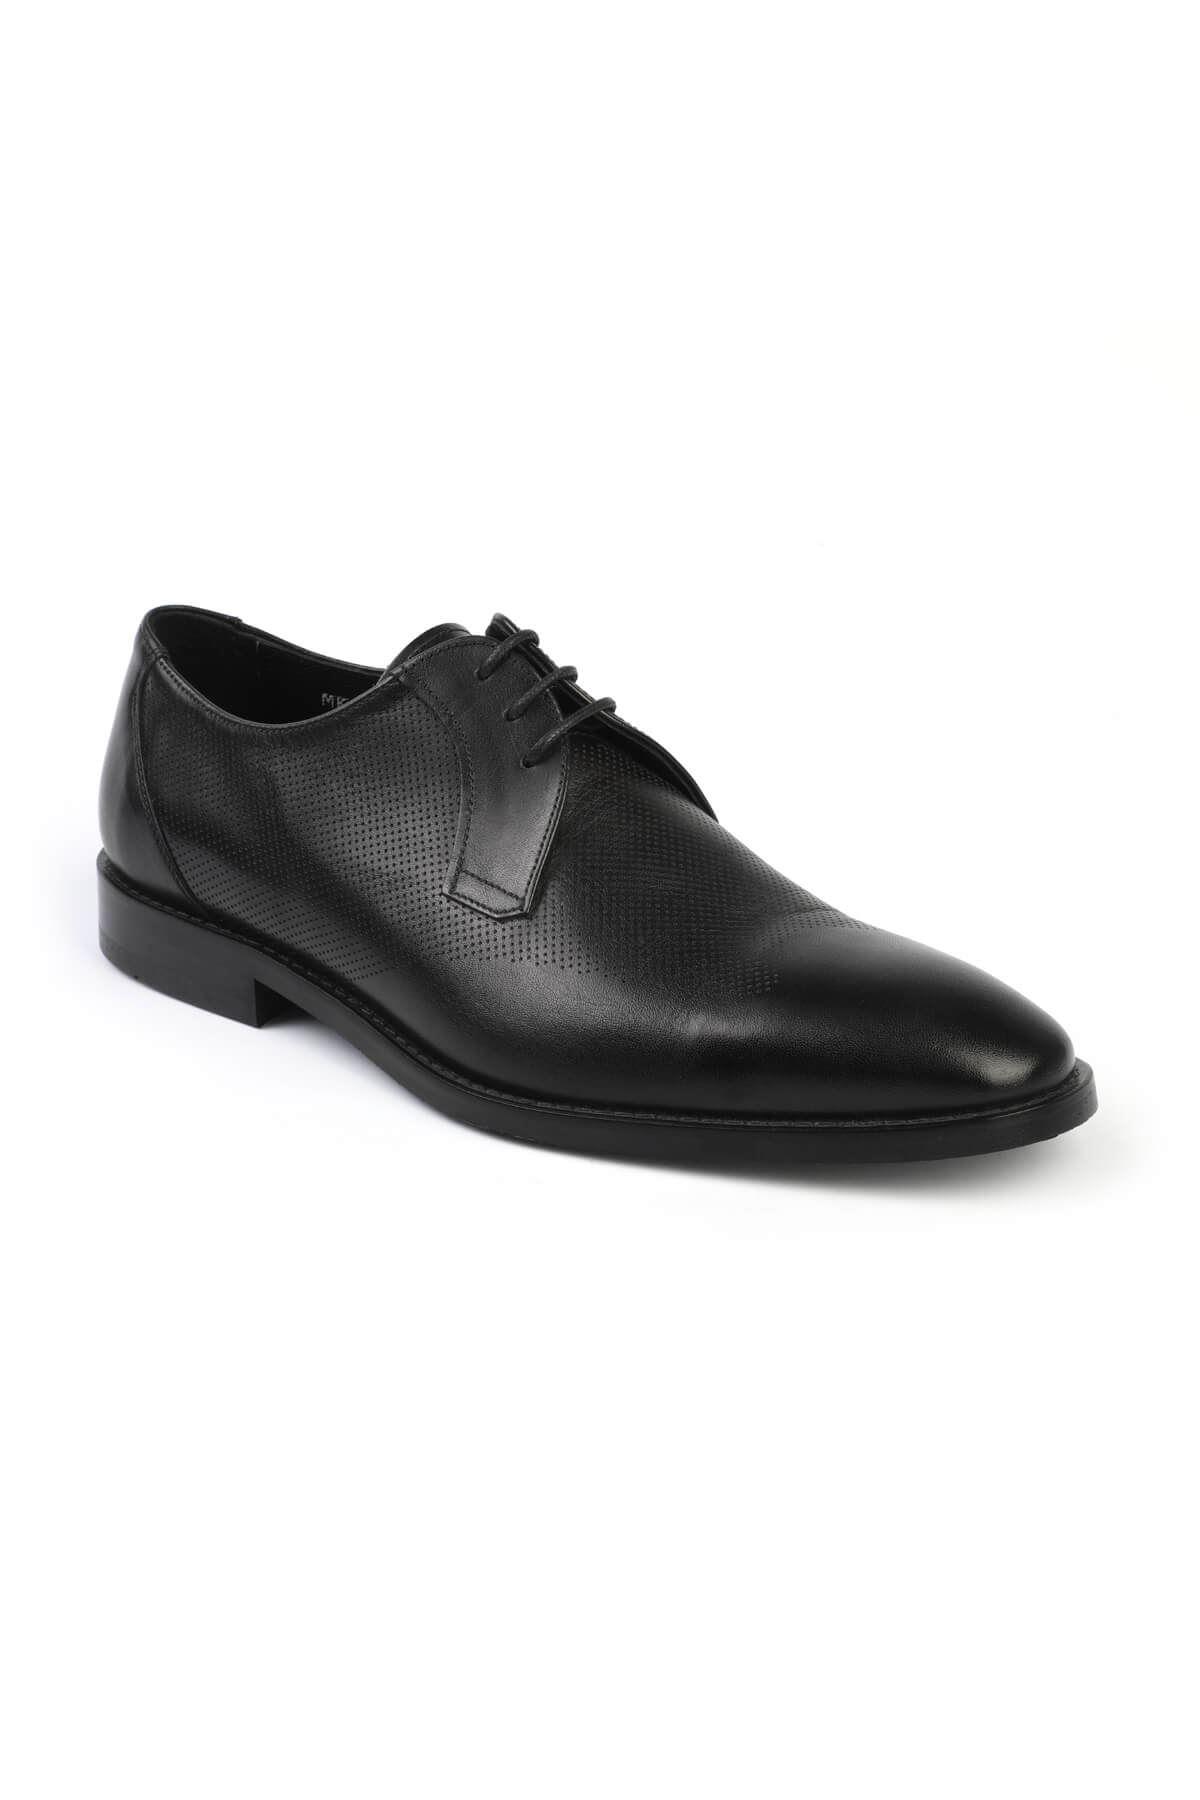 Libero 2725 Black Classic Shoes